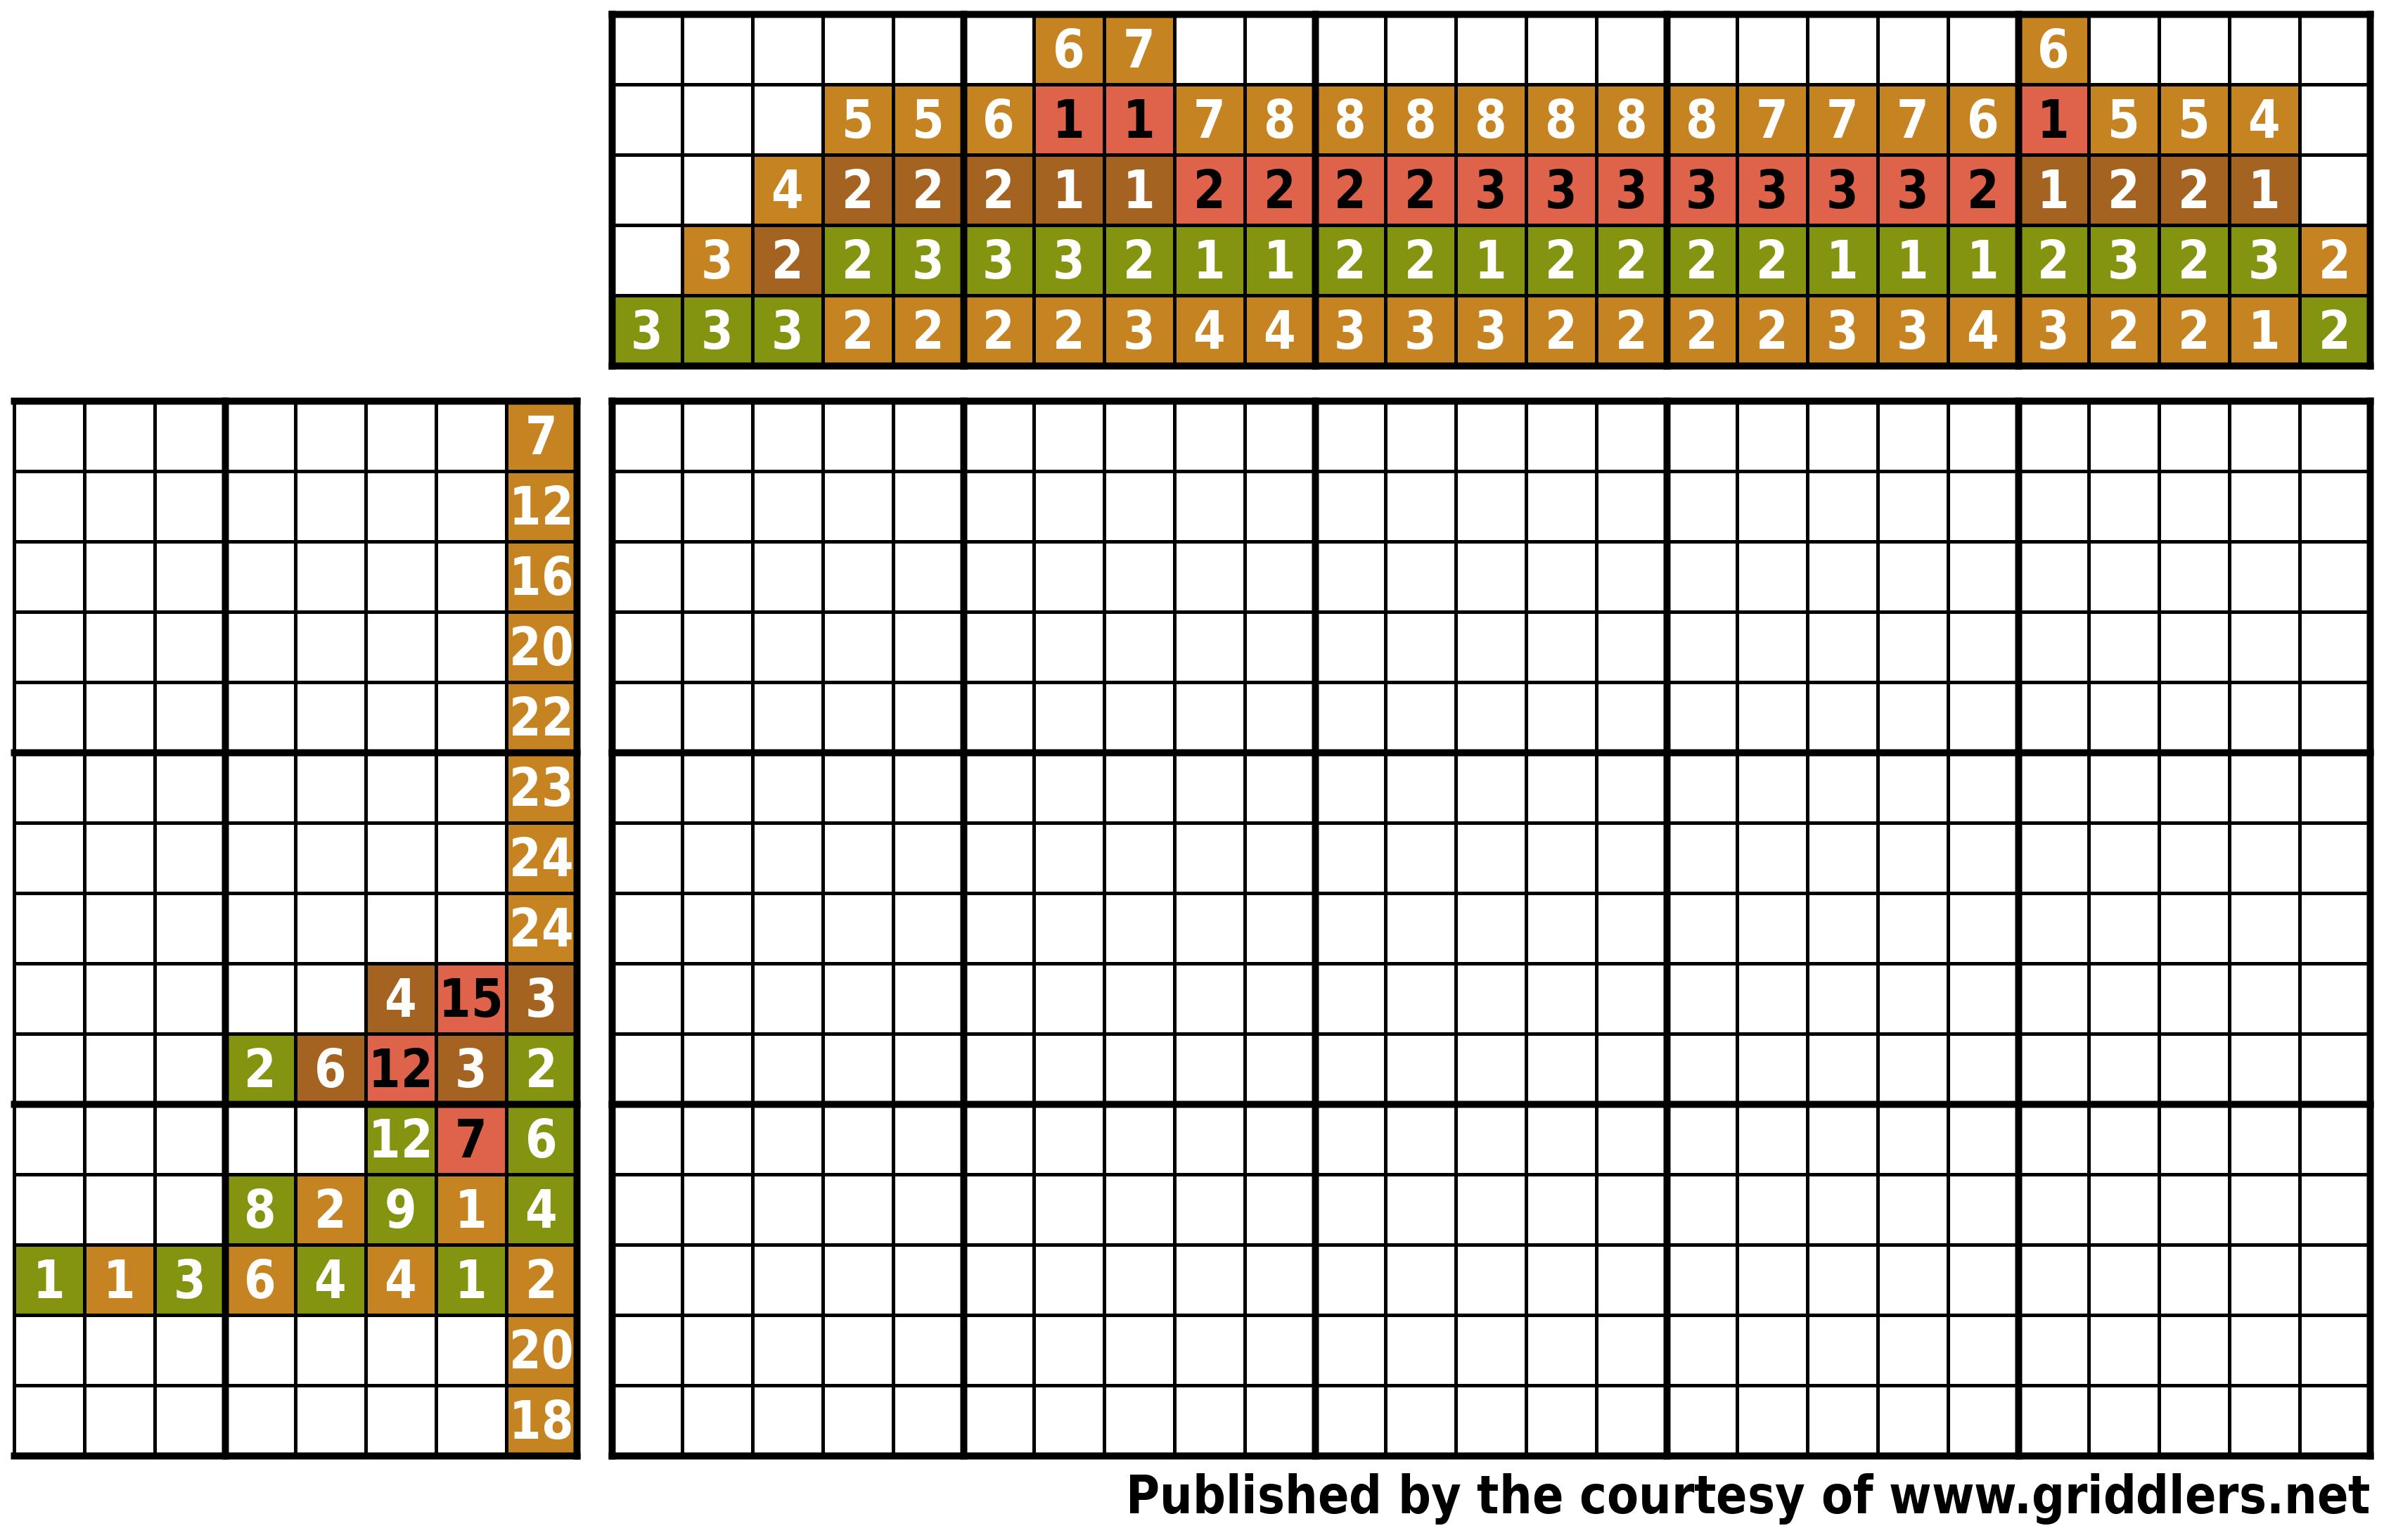 Free Printable Griddlers - Griddlers - Printable Griddlers Puzzles